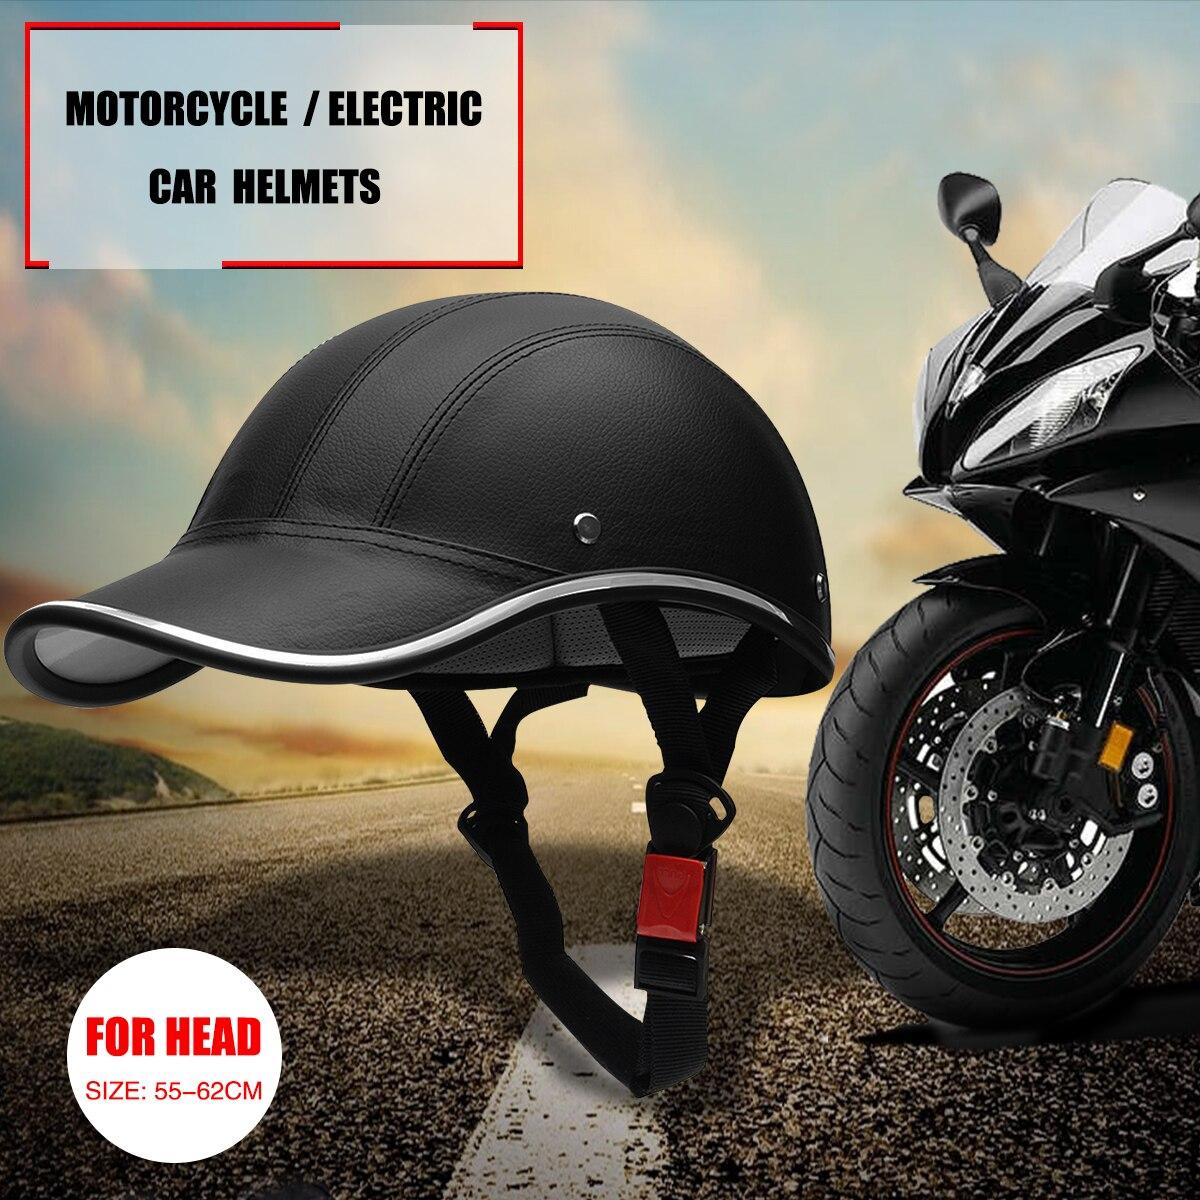 Windproof Motorcycle Electric Bike Safety Helmet Adjustable Leather Helmets US